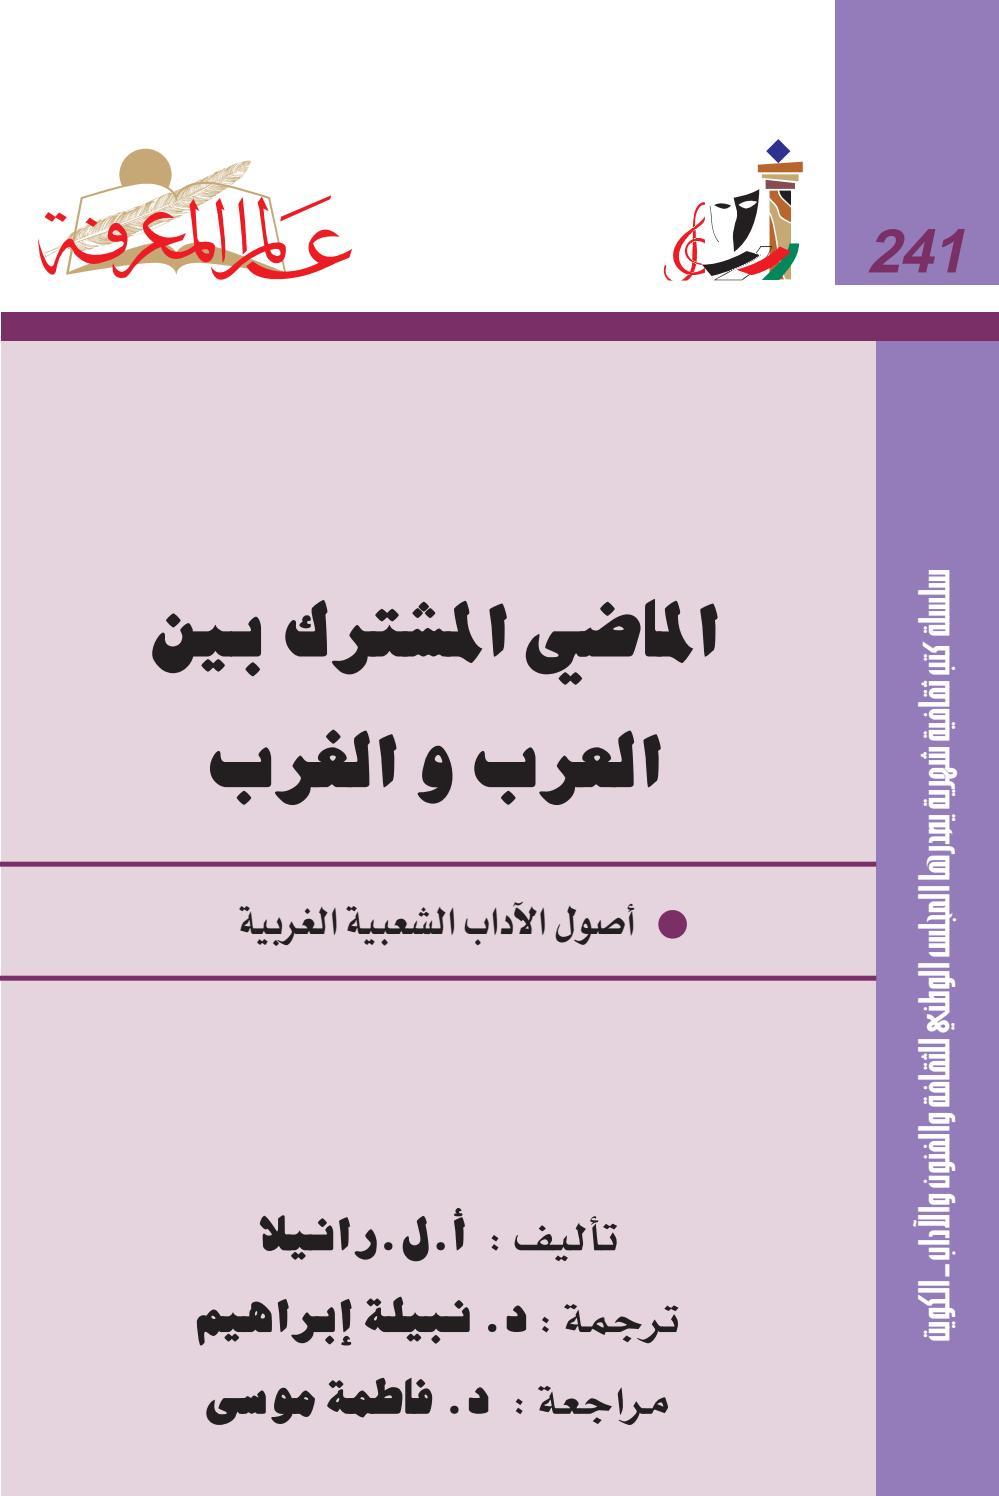 2b6d6c6b7d637 241 الماضي المشترك بين العرب والغرب by iReadPedia - issuu